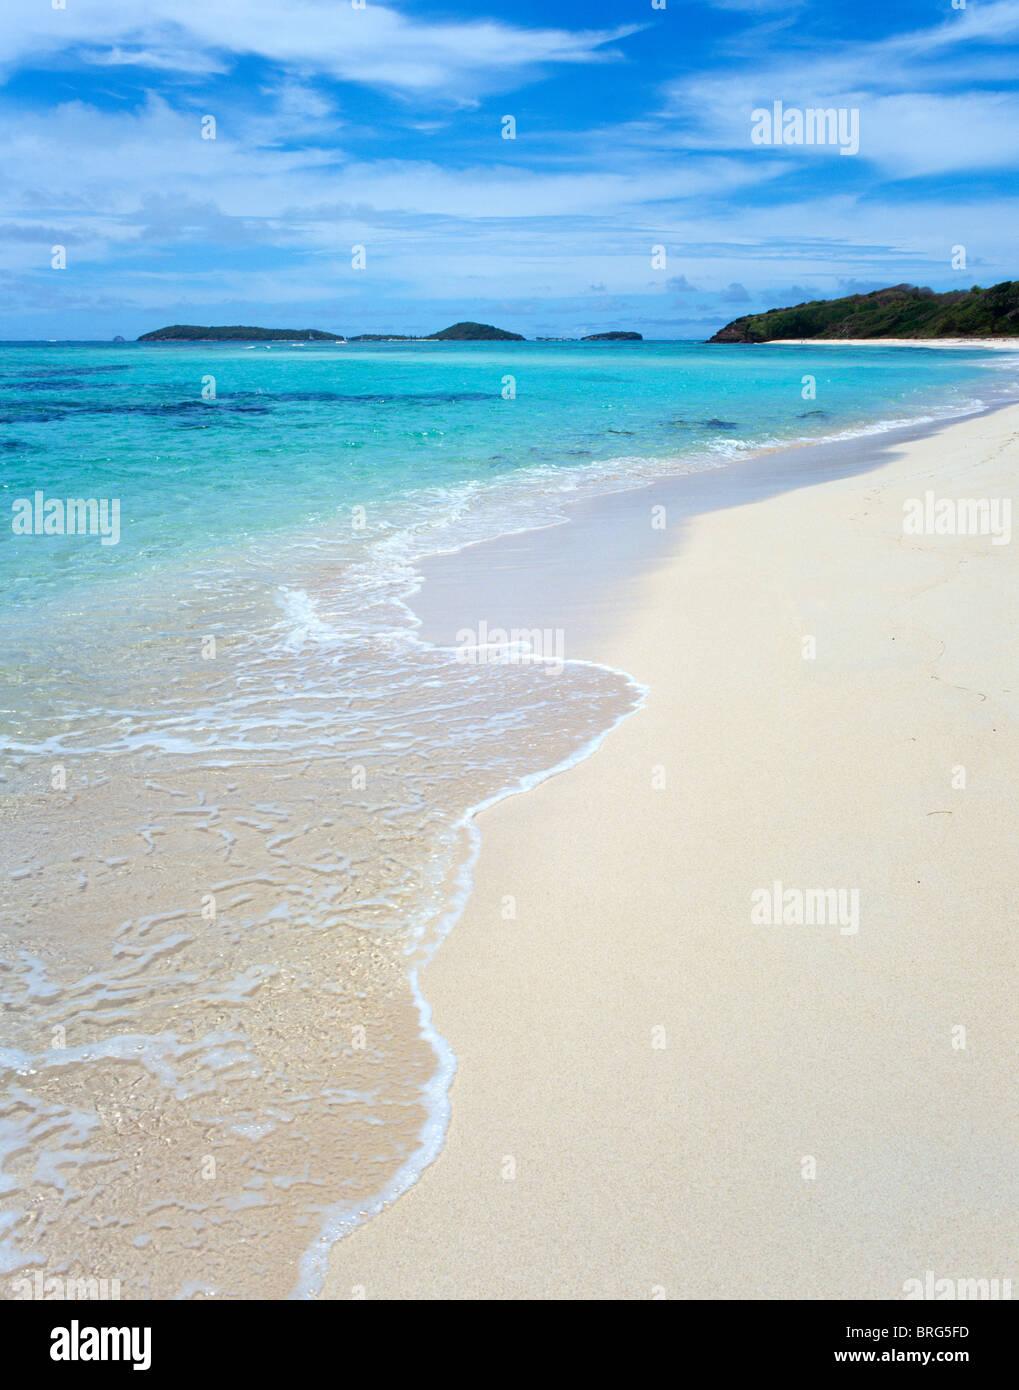 Deserted beach on Mayreau, The Grenadines, Caribbean, West Indies - Stock Image